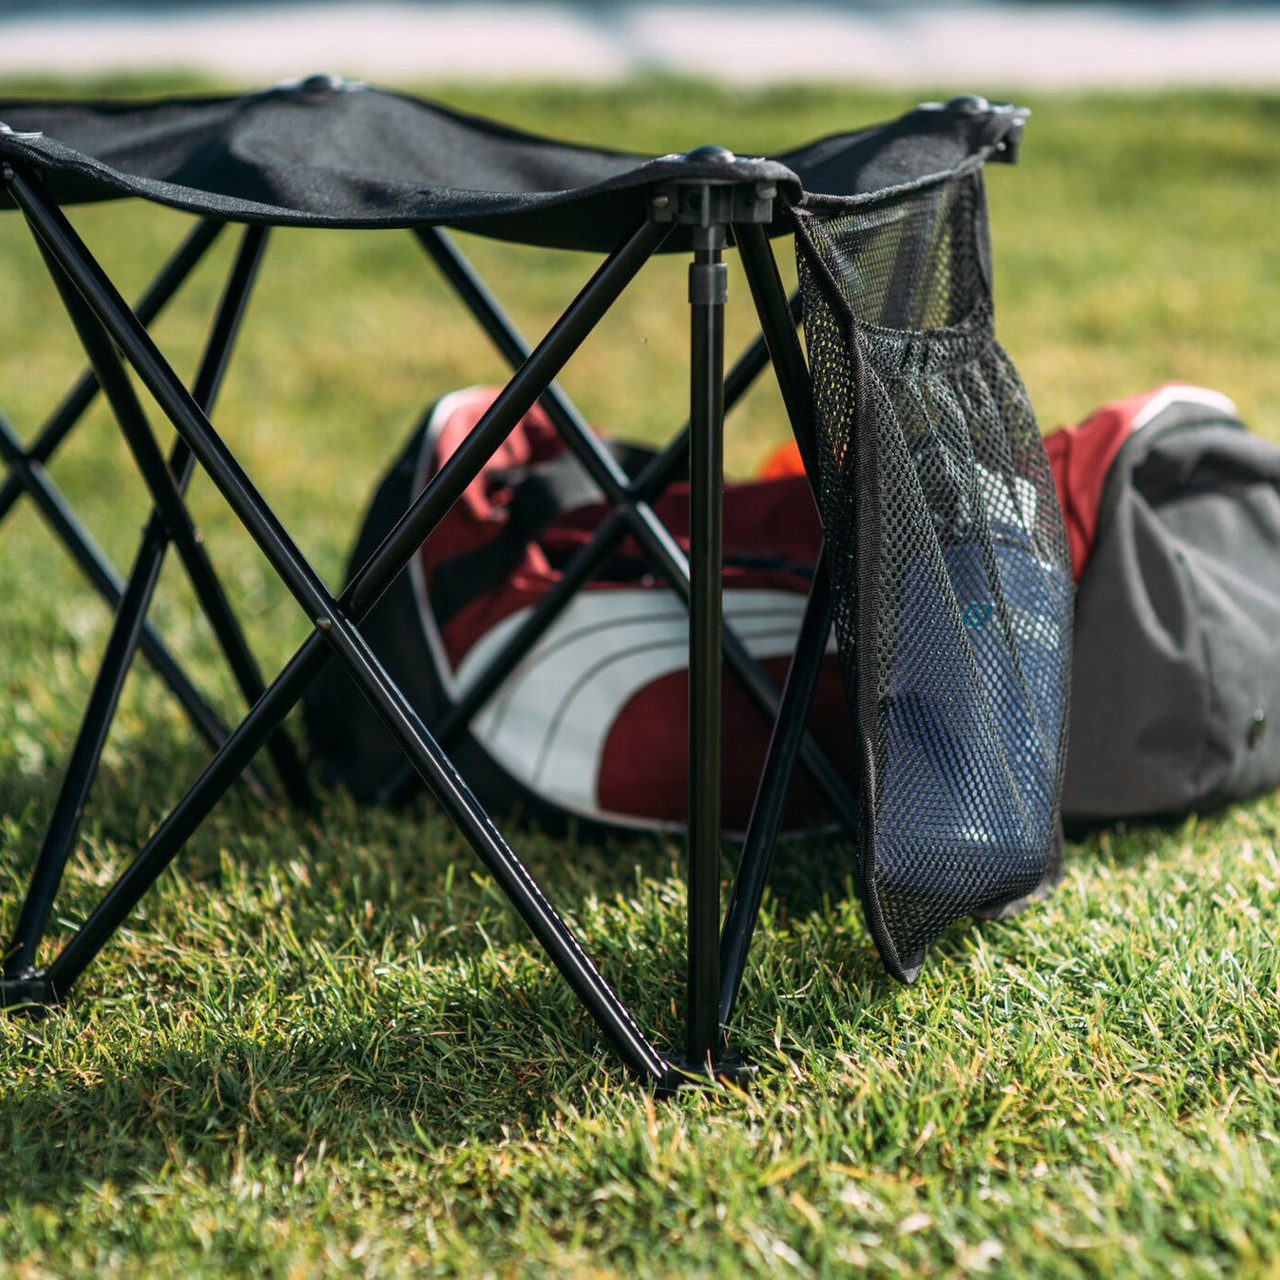 TravelBench 6 Seat Folding Player Bench